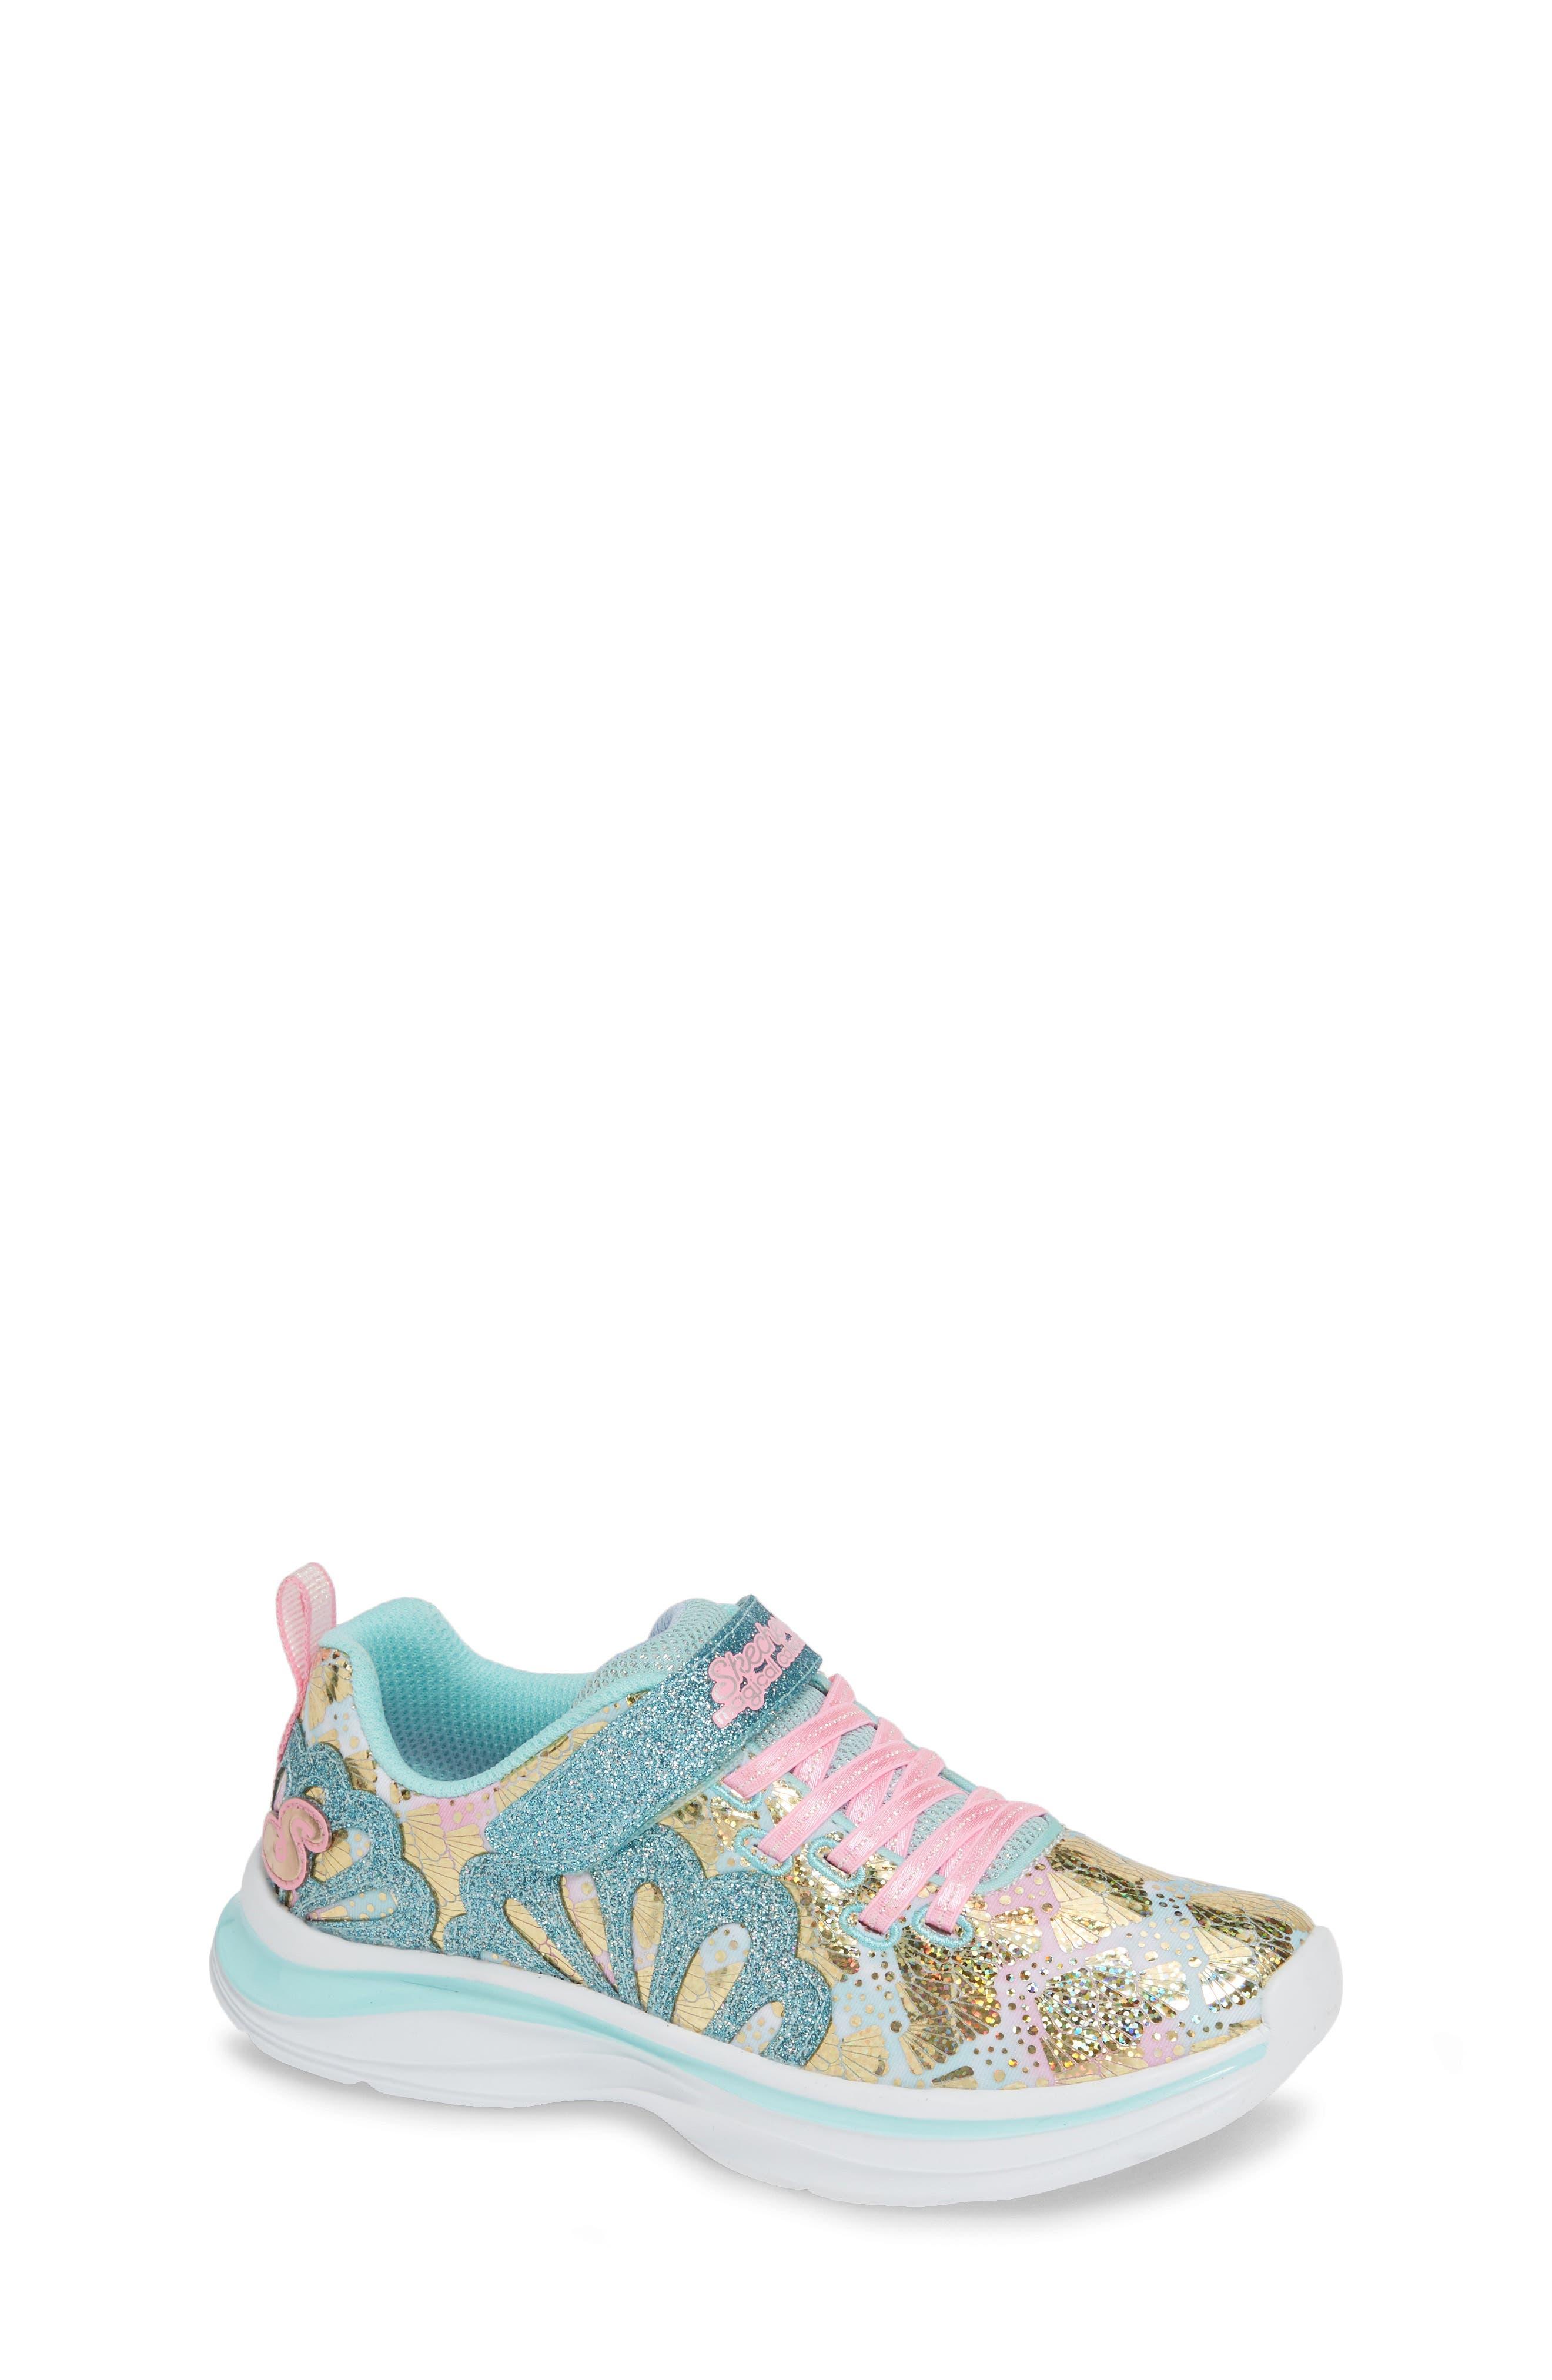 Double Dreams Shimmer Sneaker,                             Main thumbnail 1, color,                             AQUA/ PINK TEXTILE